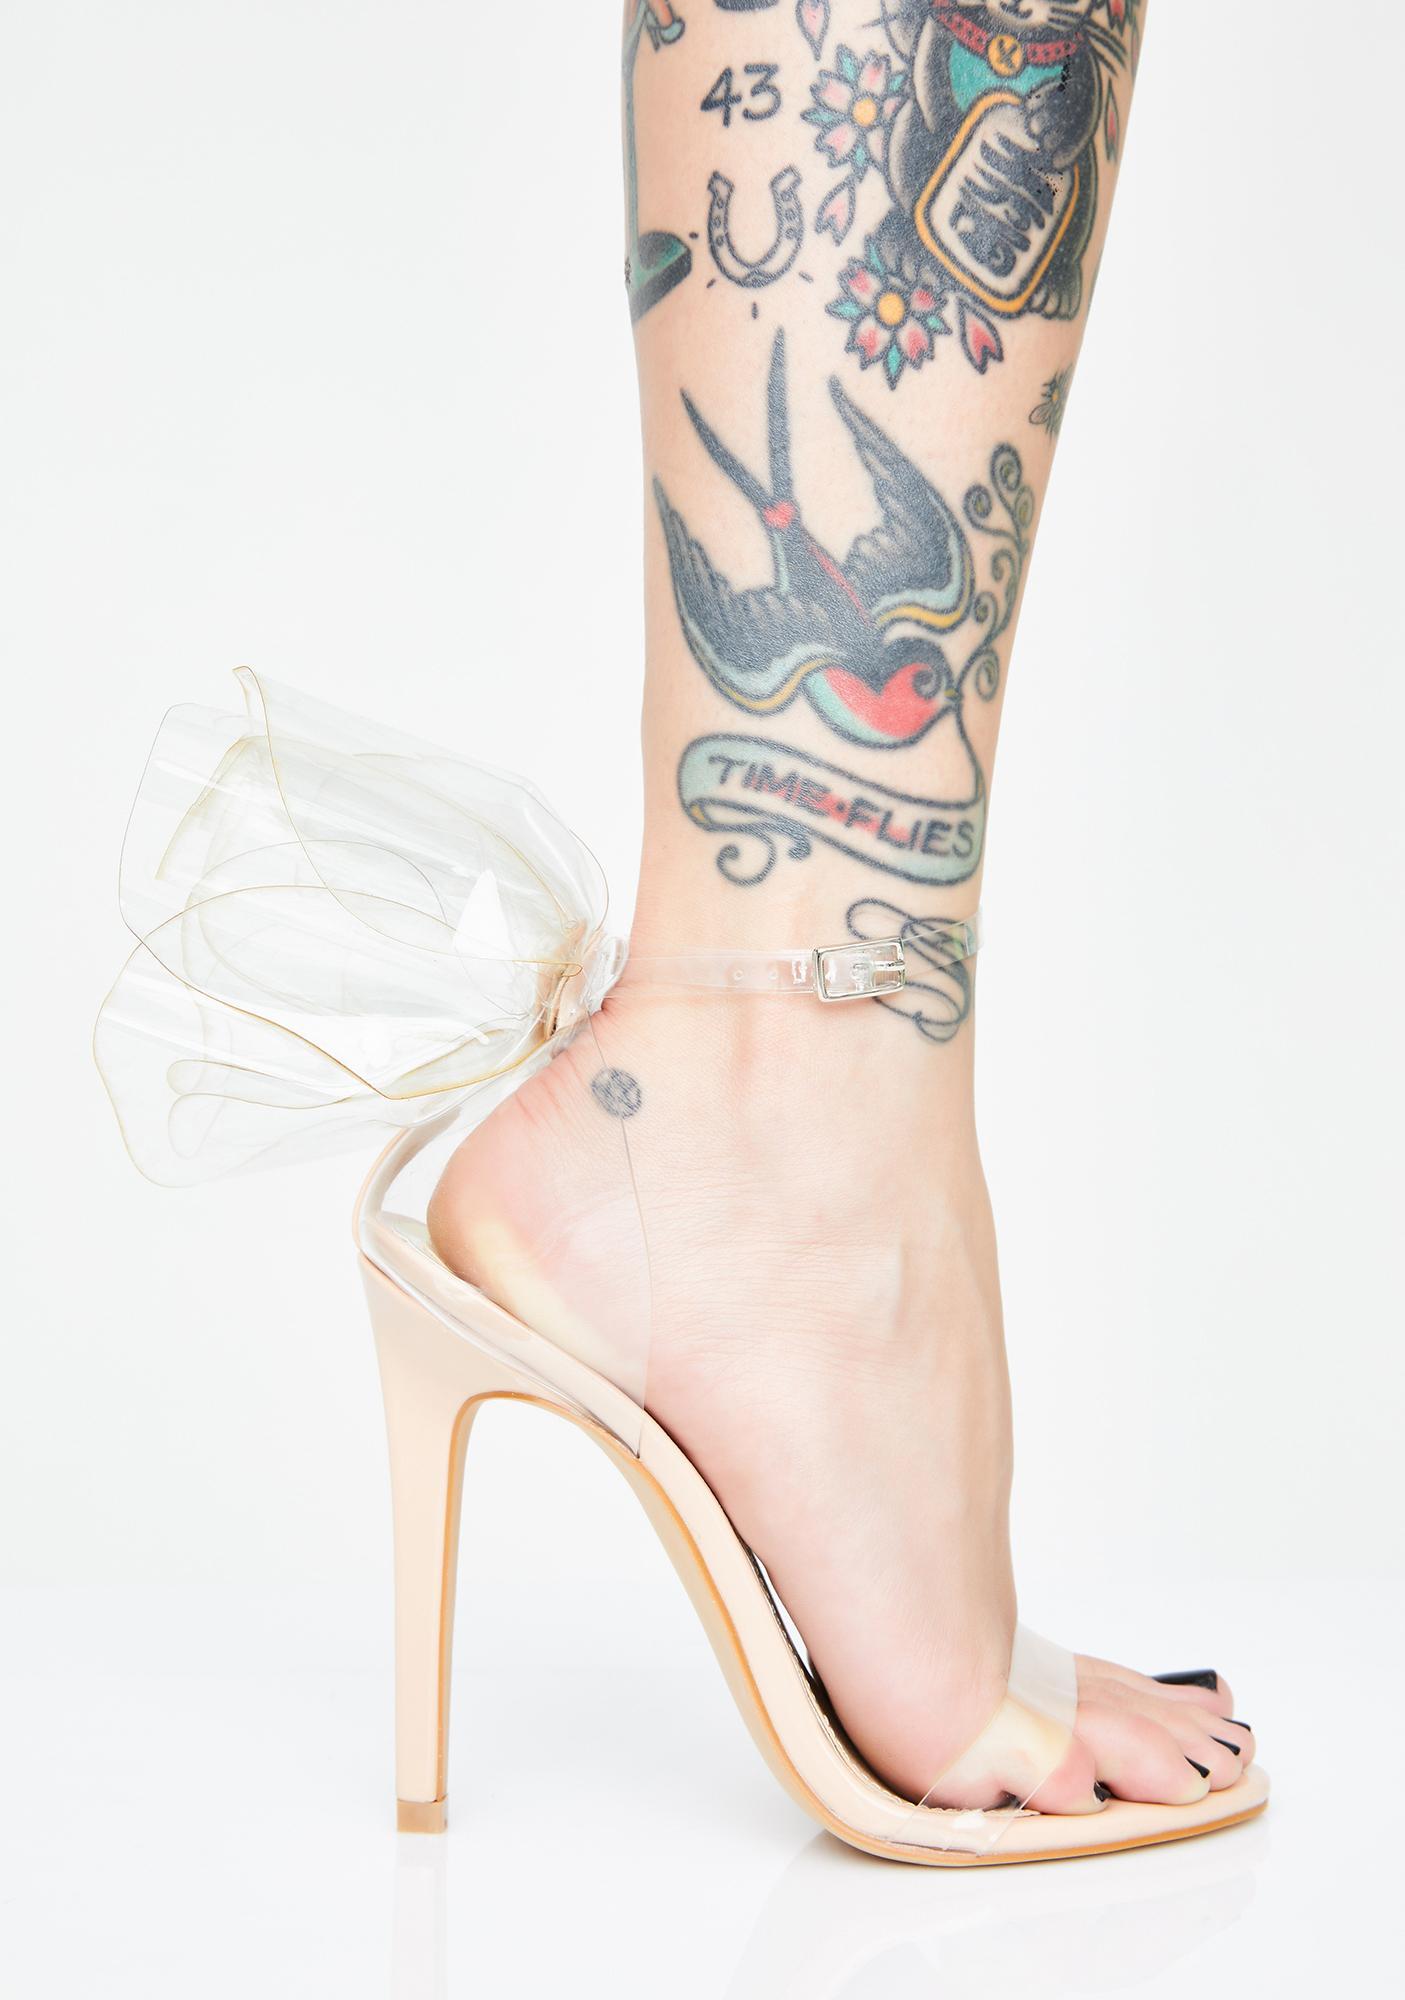 Prissy Princess Stiletto Heels